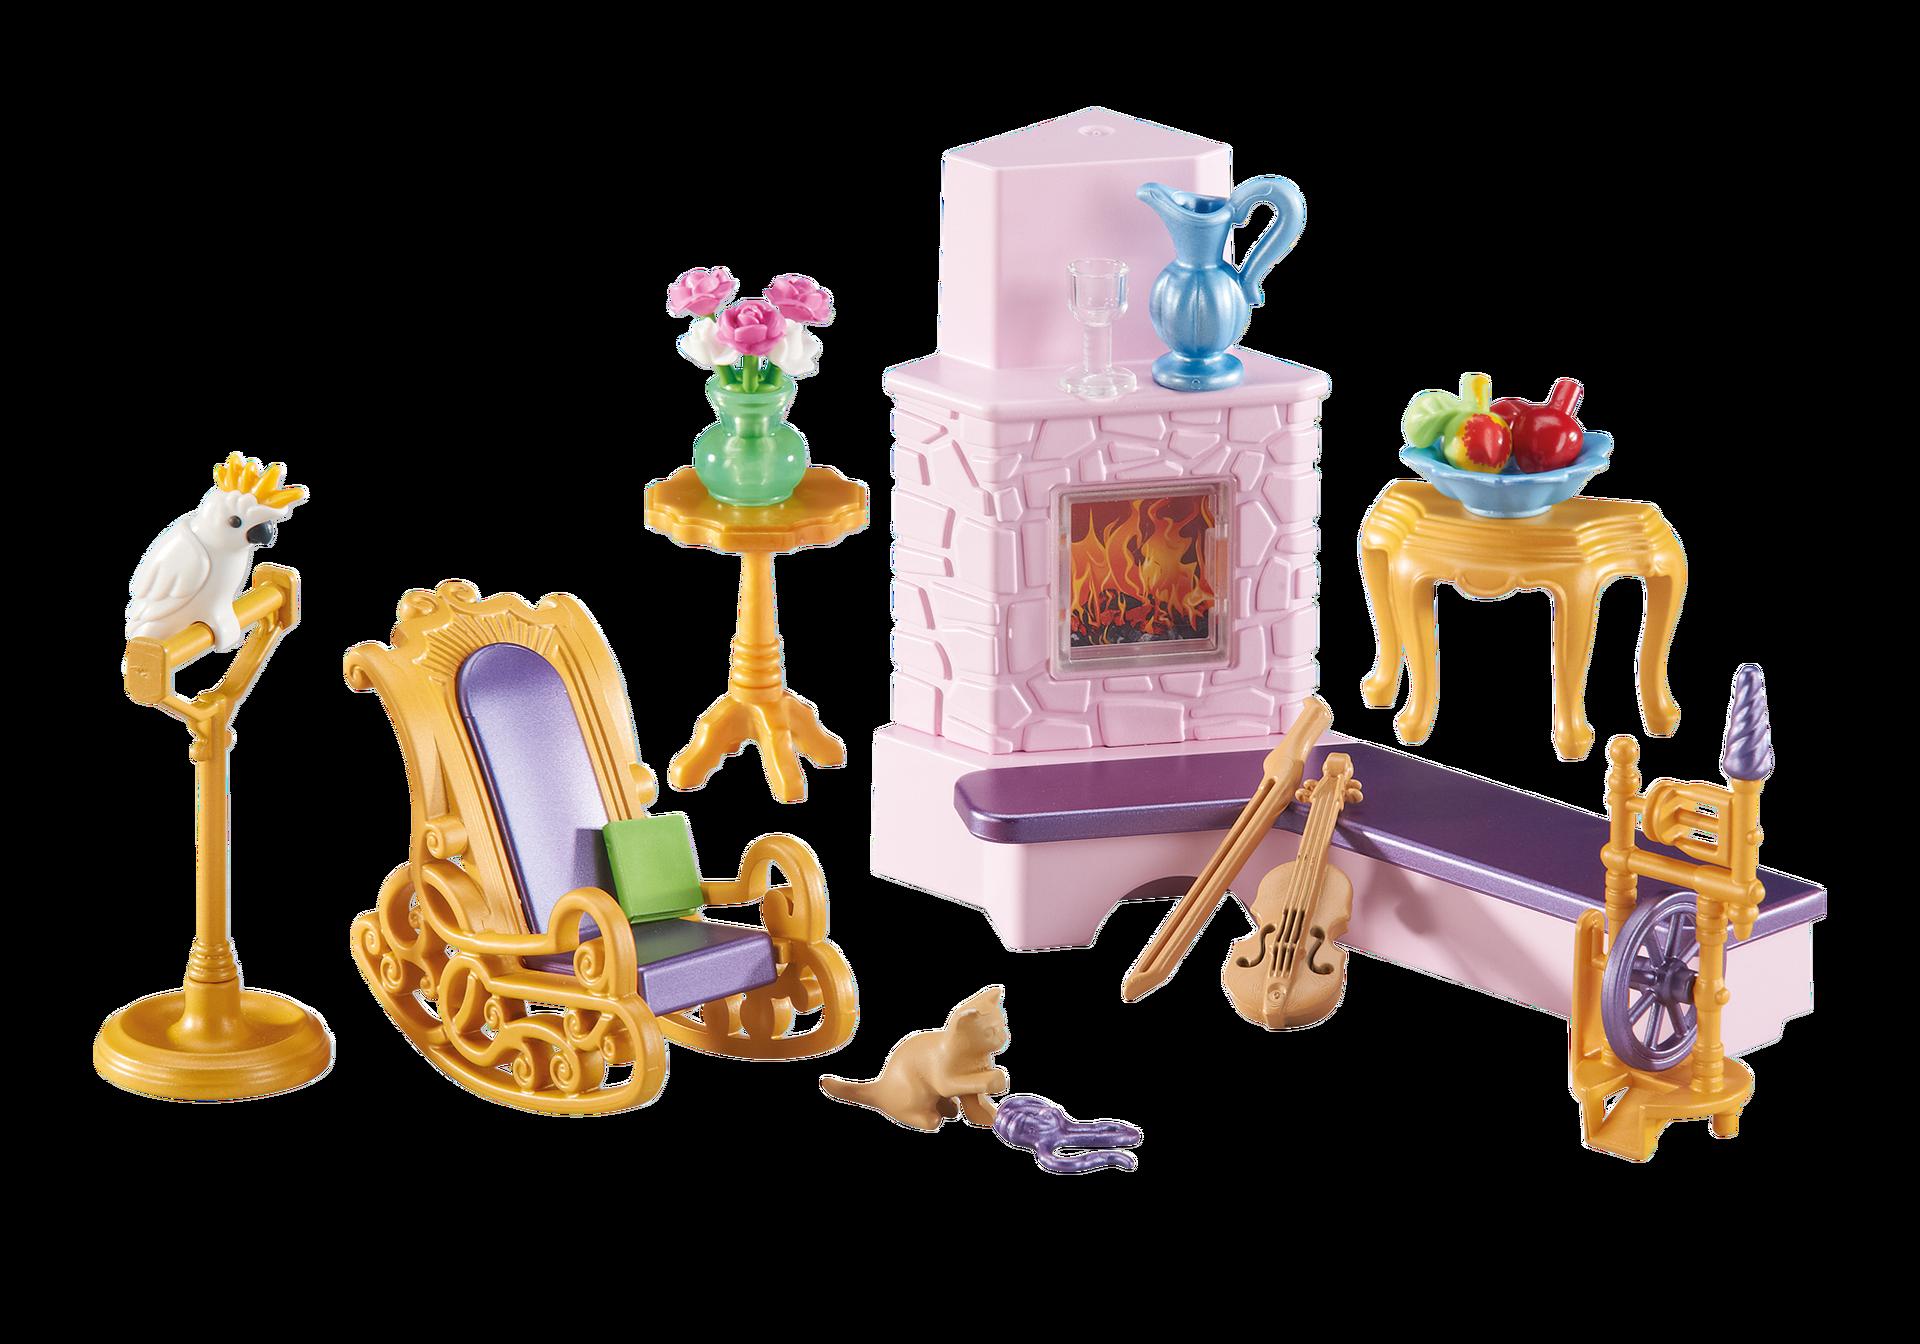 Fairytale clipart aquarium castle. Http media playmobil com